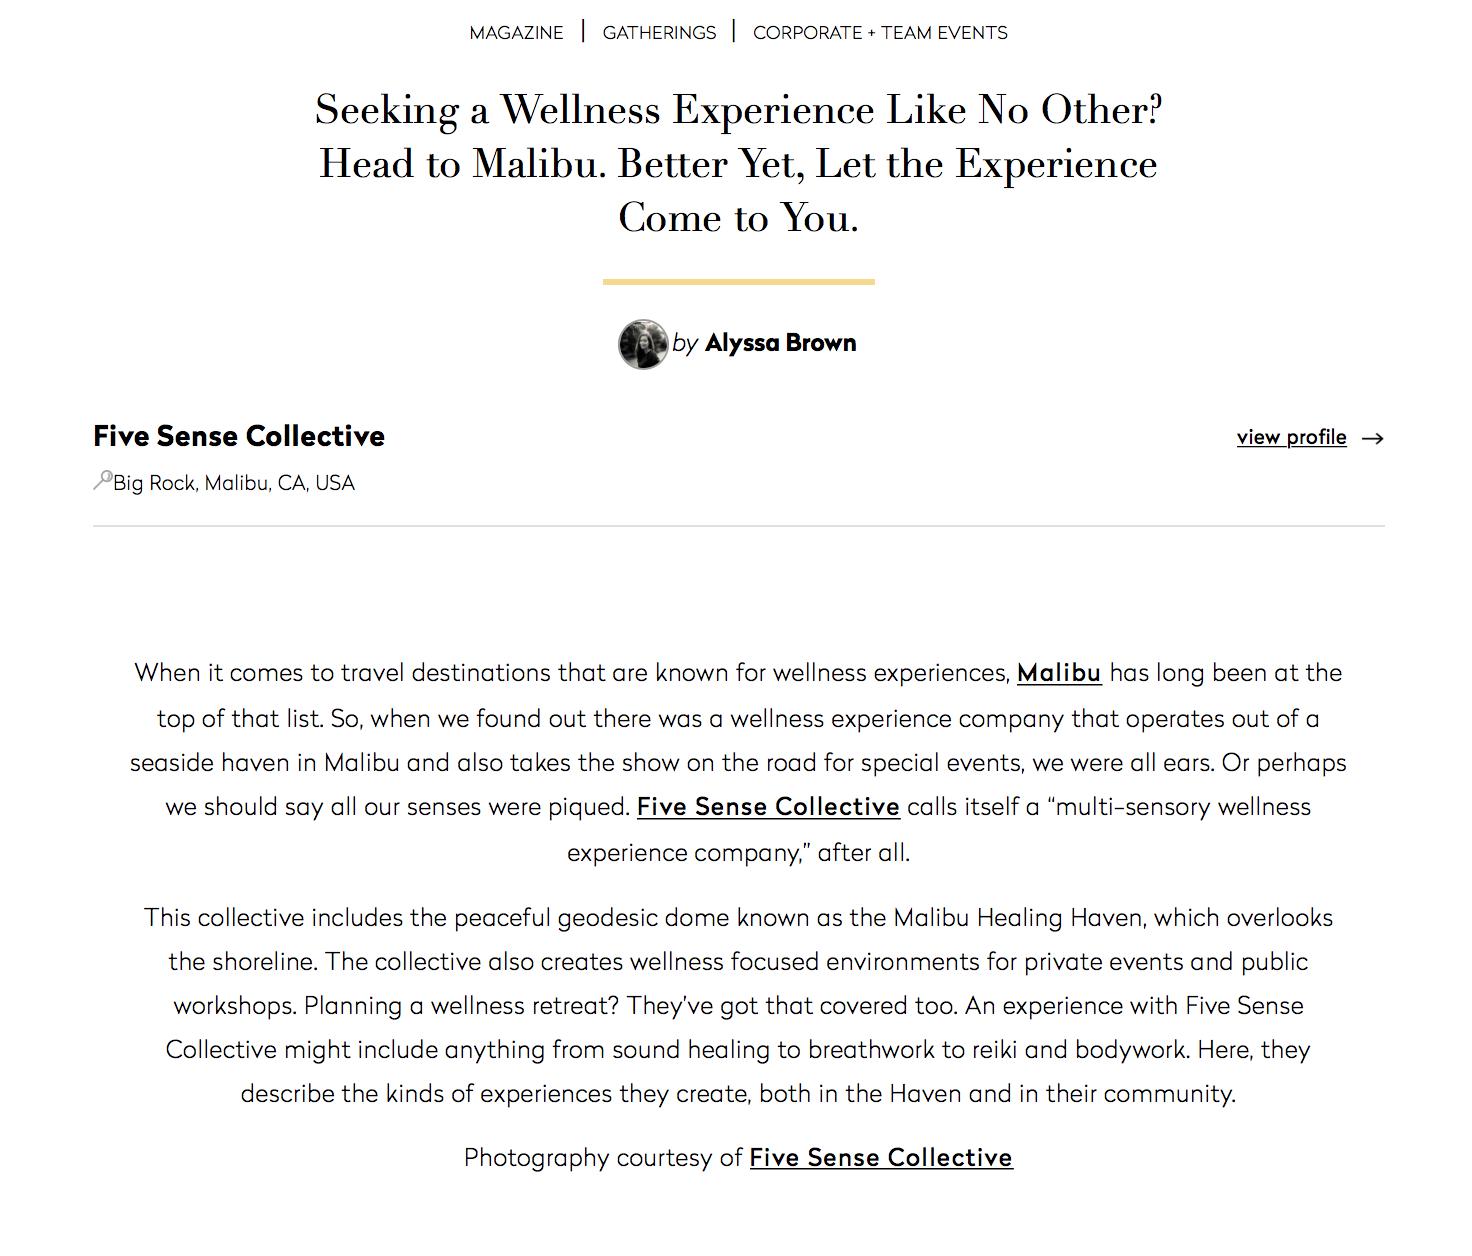 five sense collective venuse report malibu sound bath healing haven 1.png